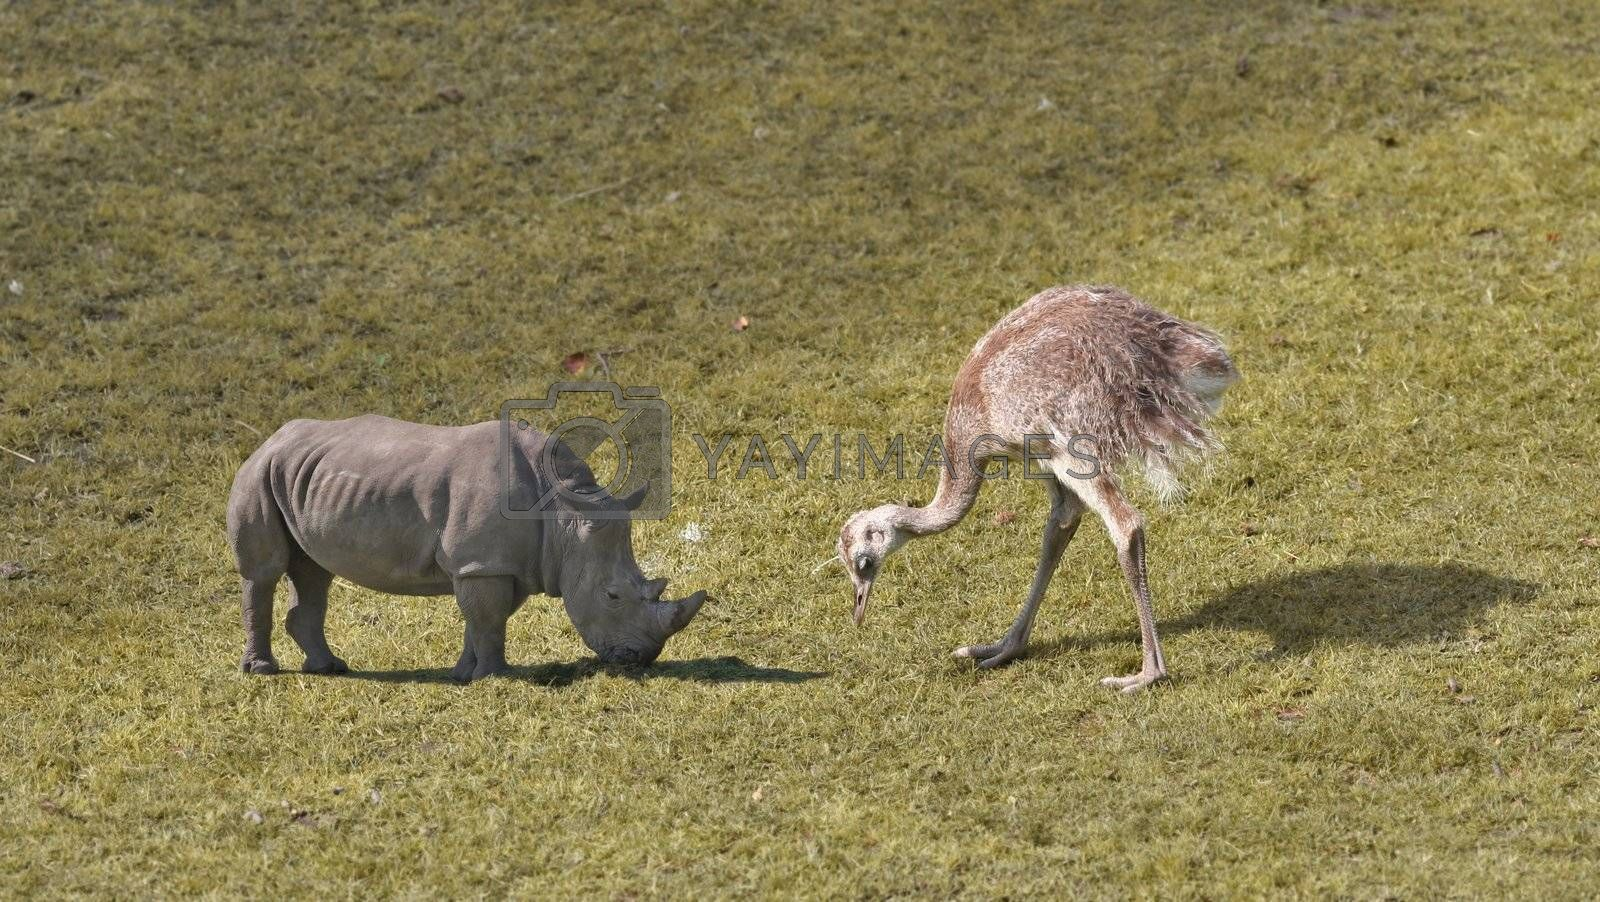 Giant animals grazing on grass.